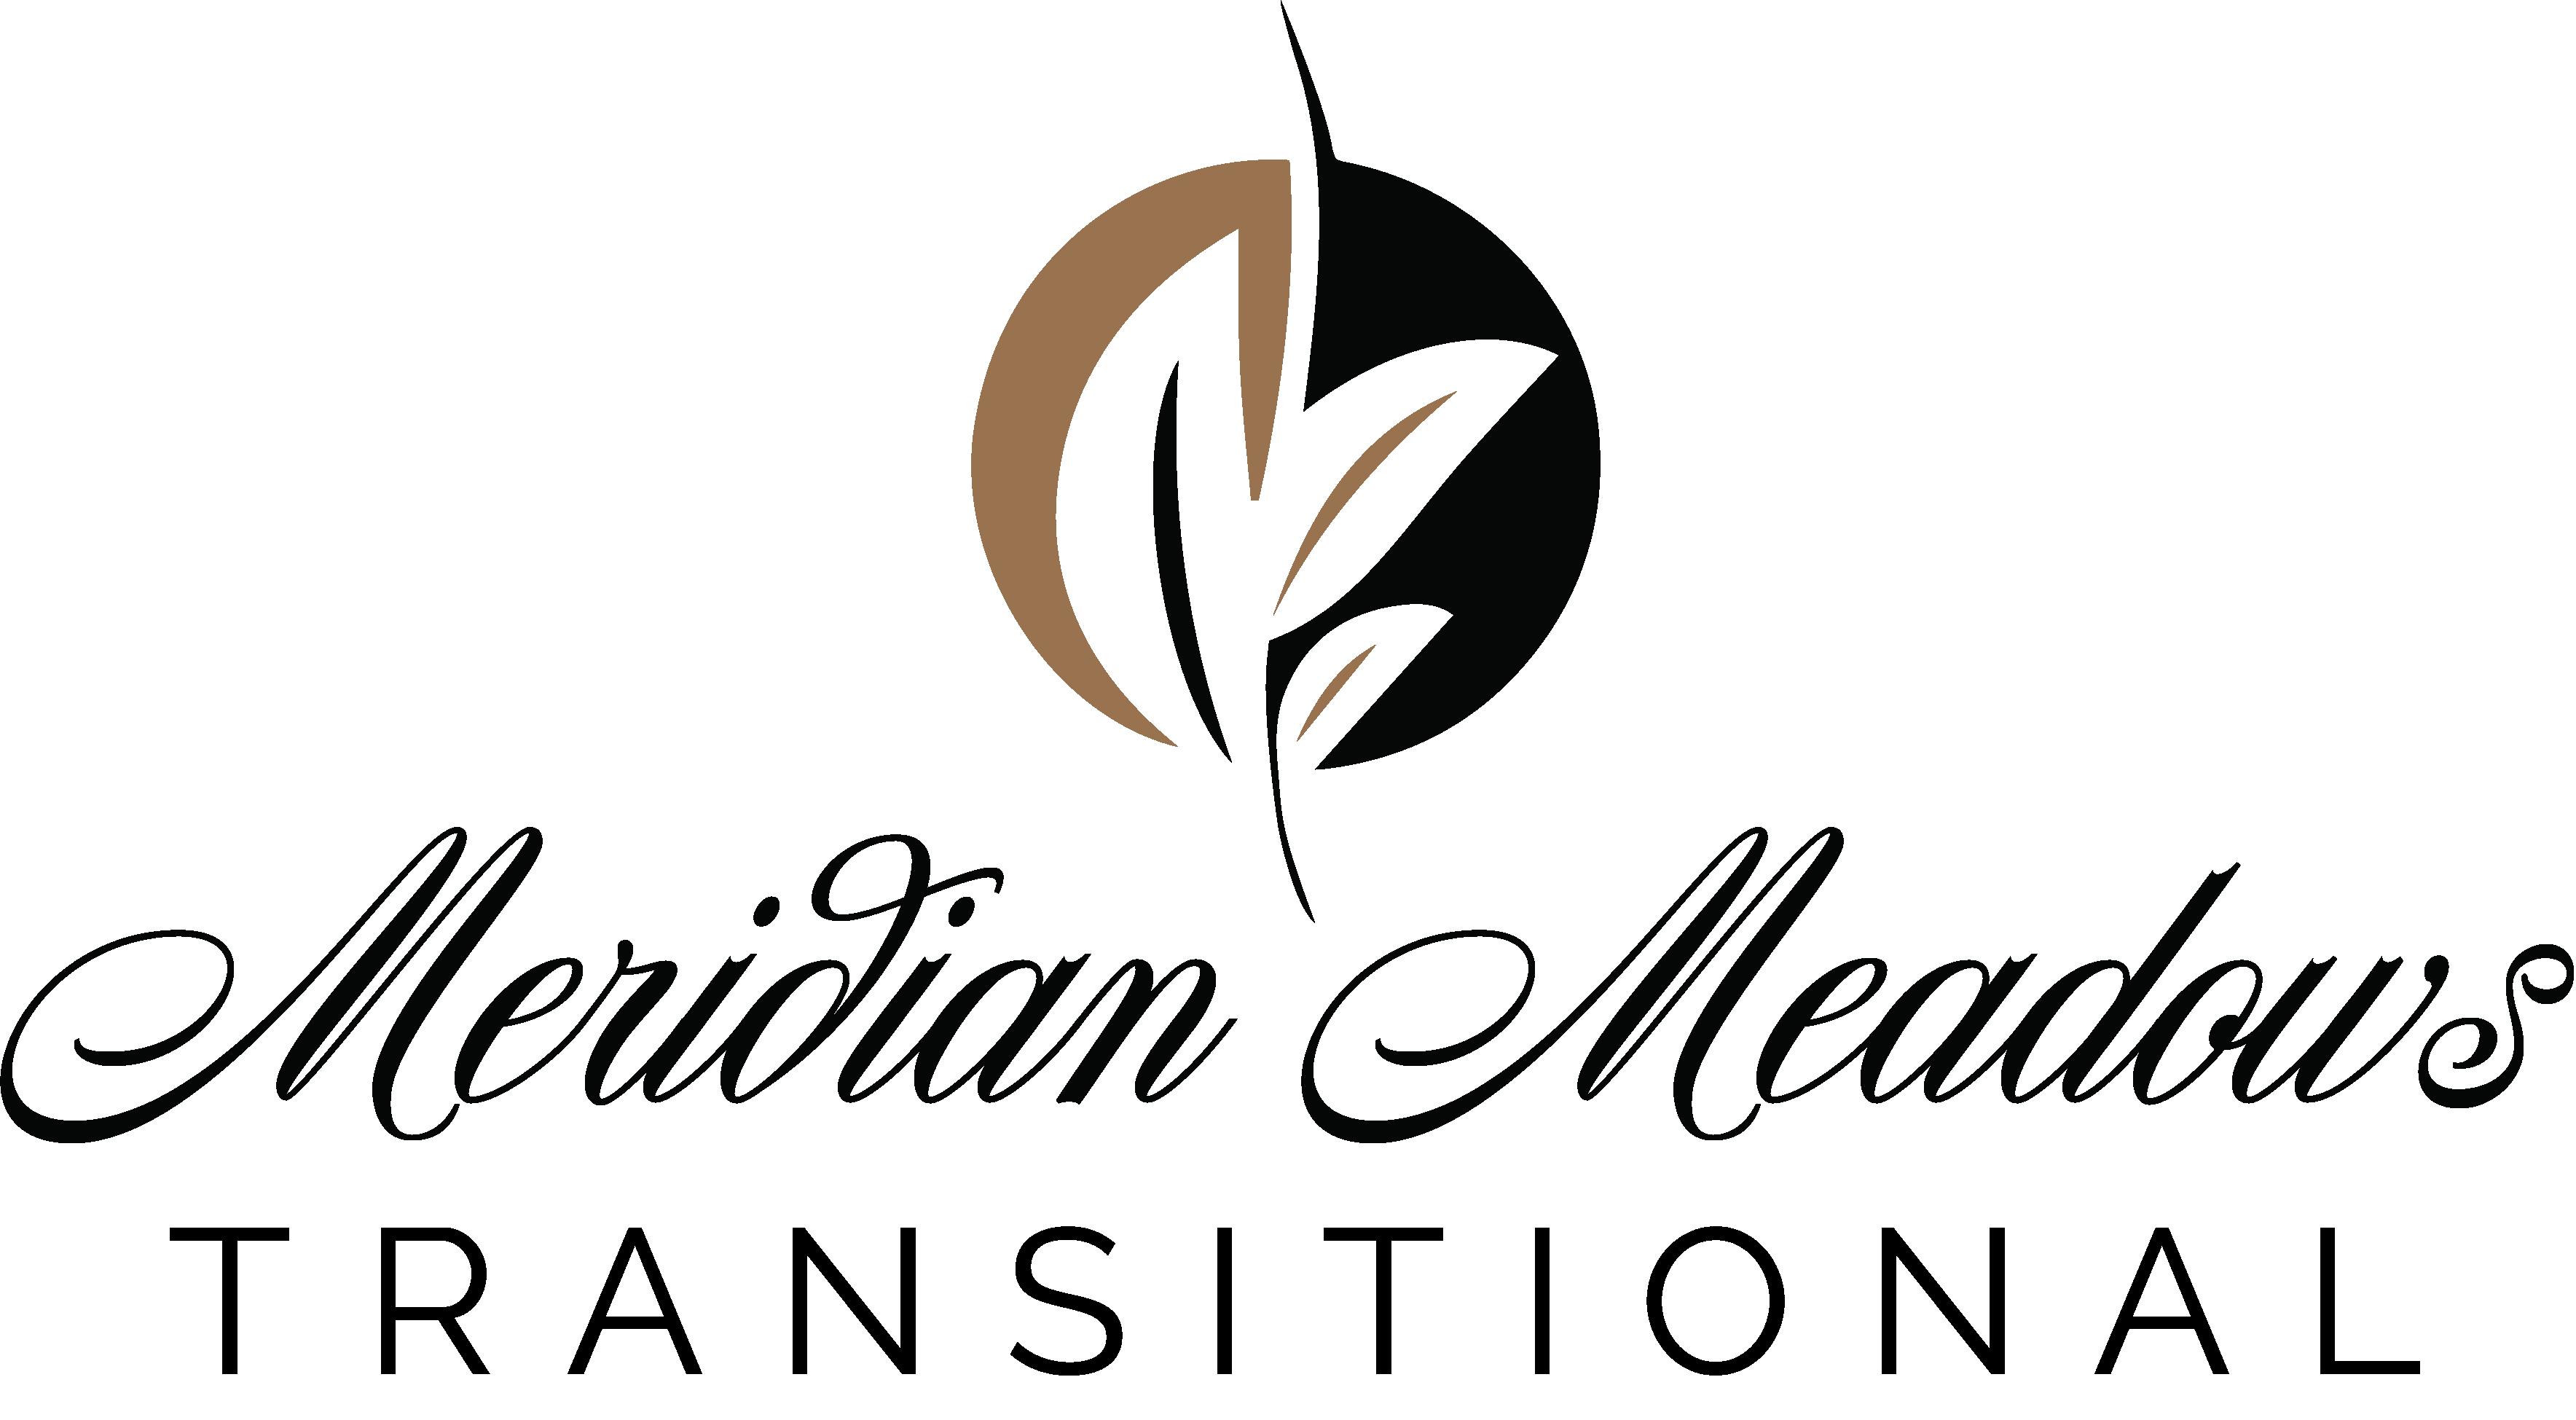 Meridian Meadows Transitional Logo